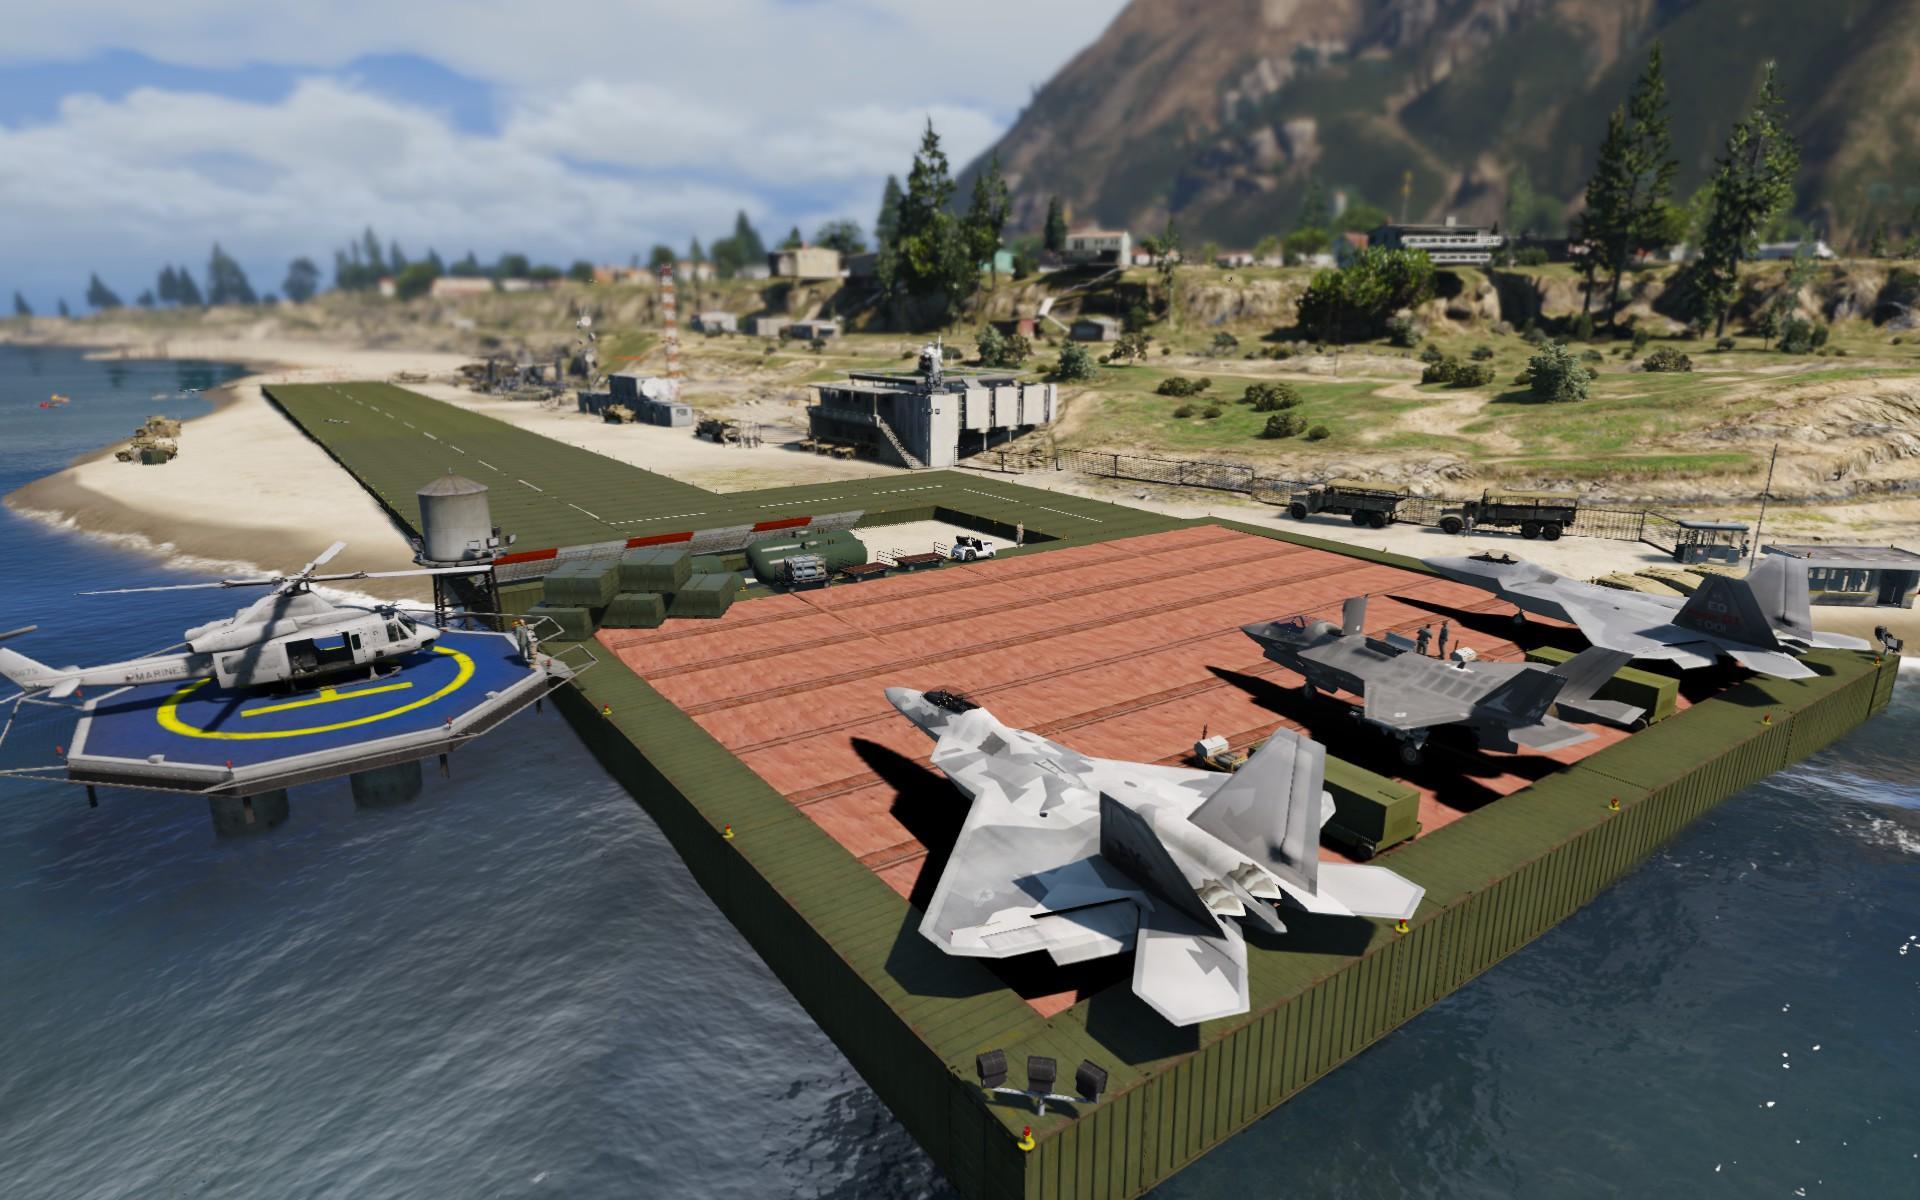 Paleto Bay Military Airport